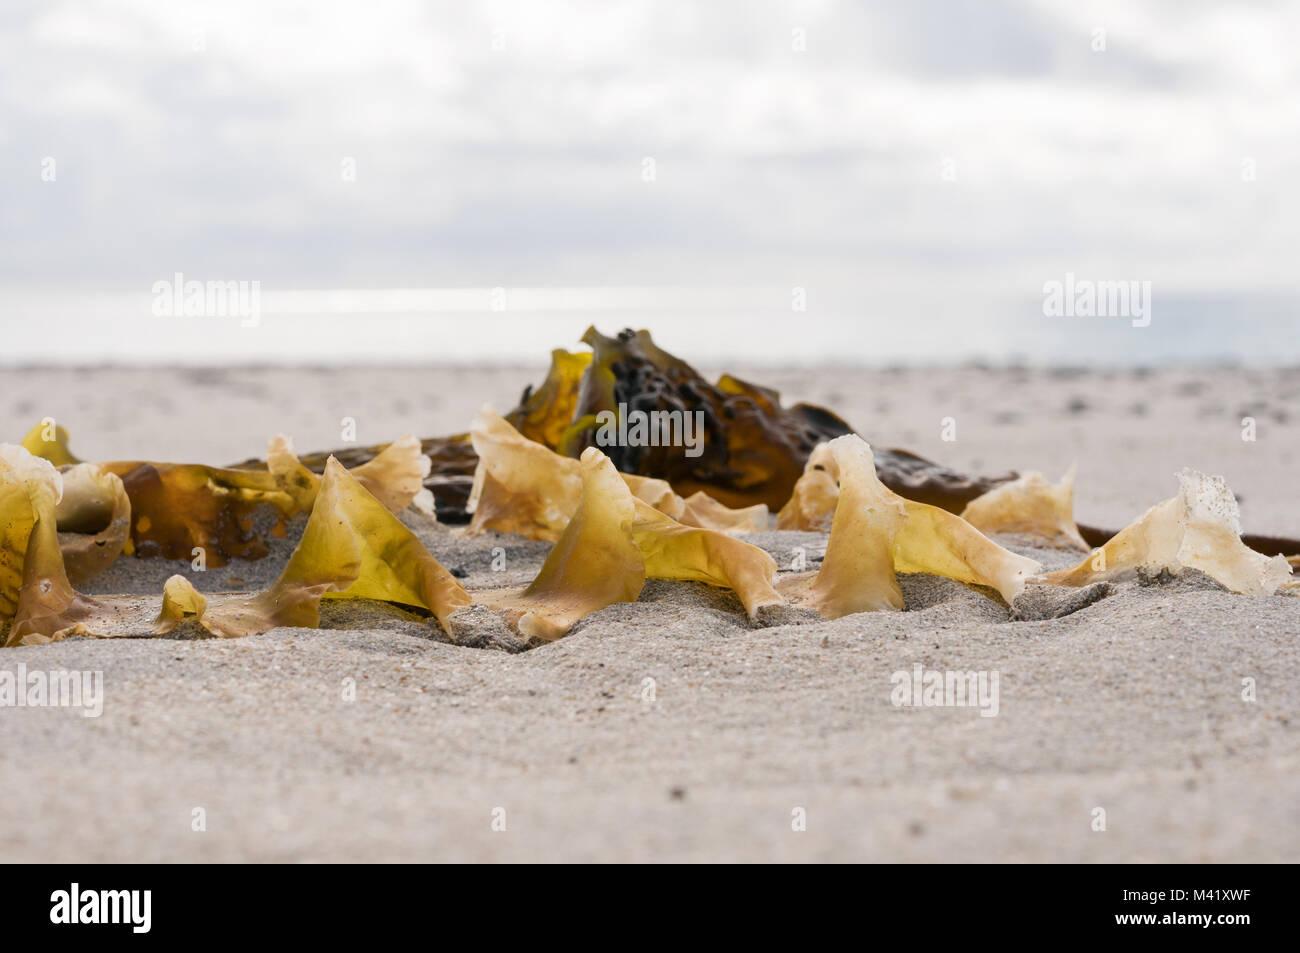 Seaweed on the beach - Stock Image